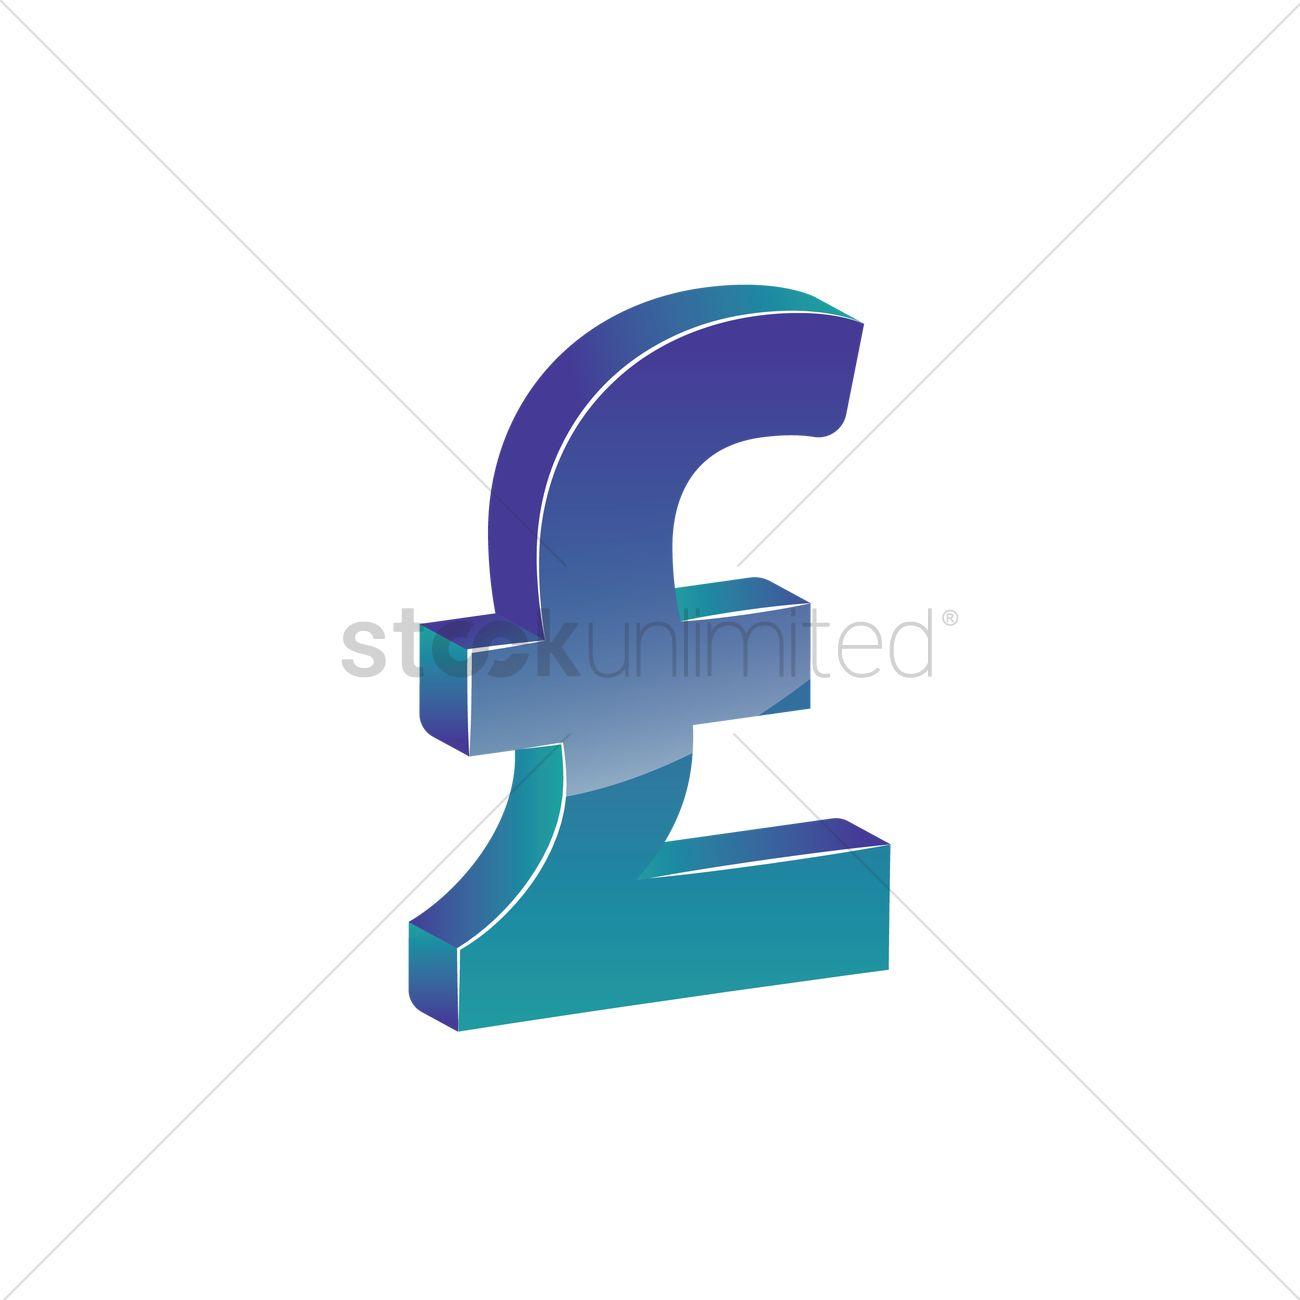 Uk Pound Sterling Symbol Vector Image 1866308 Stockunlimited